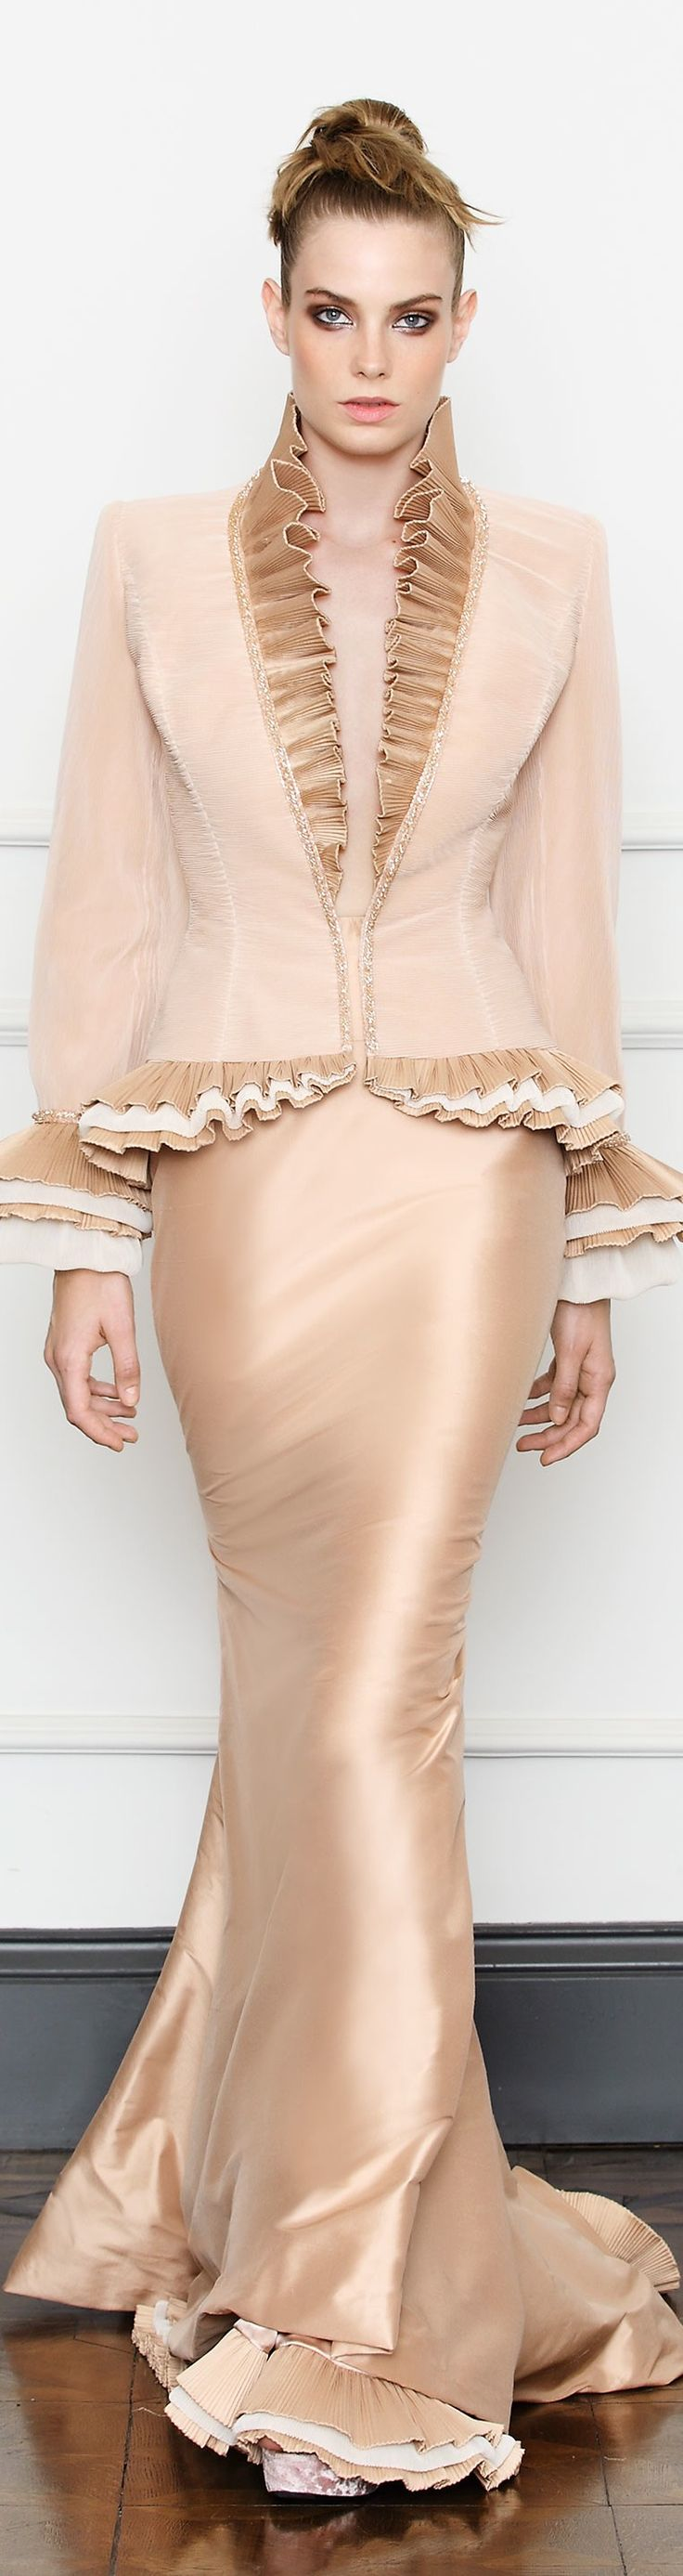 Dilek Hanif couture 2015/16                                                                                                                                                     Más